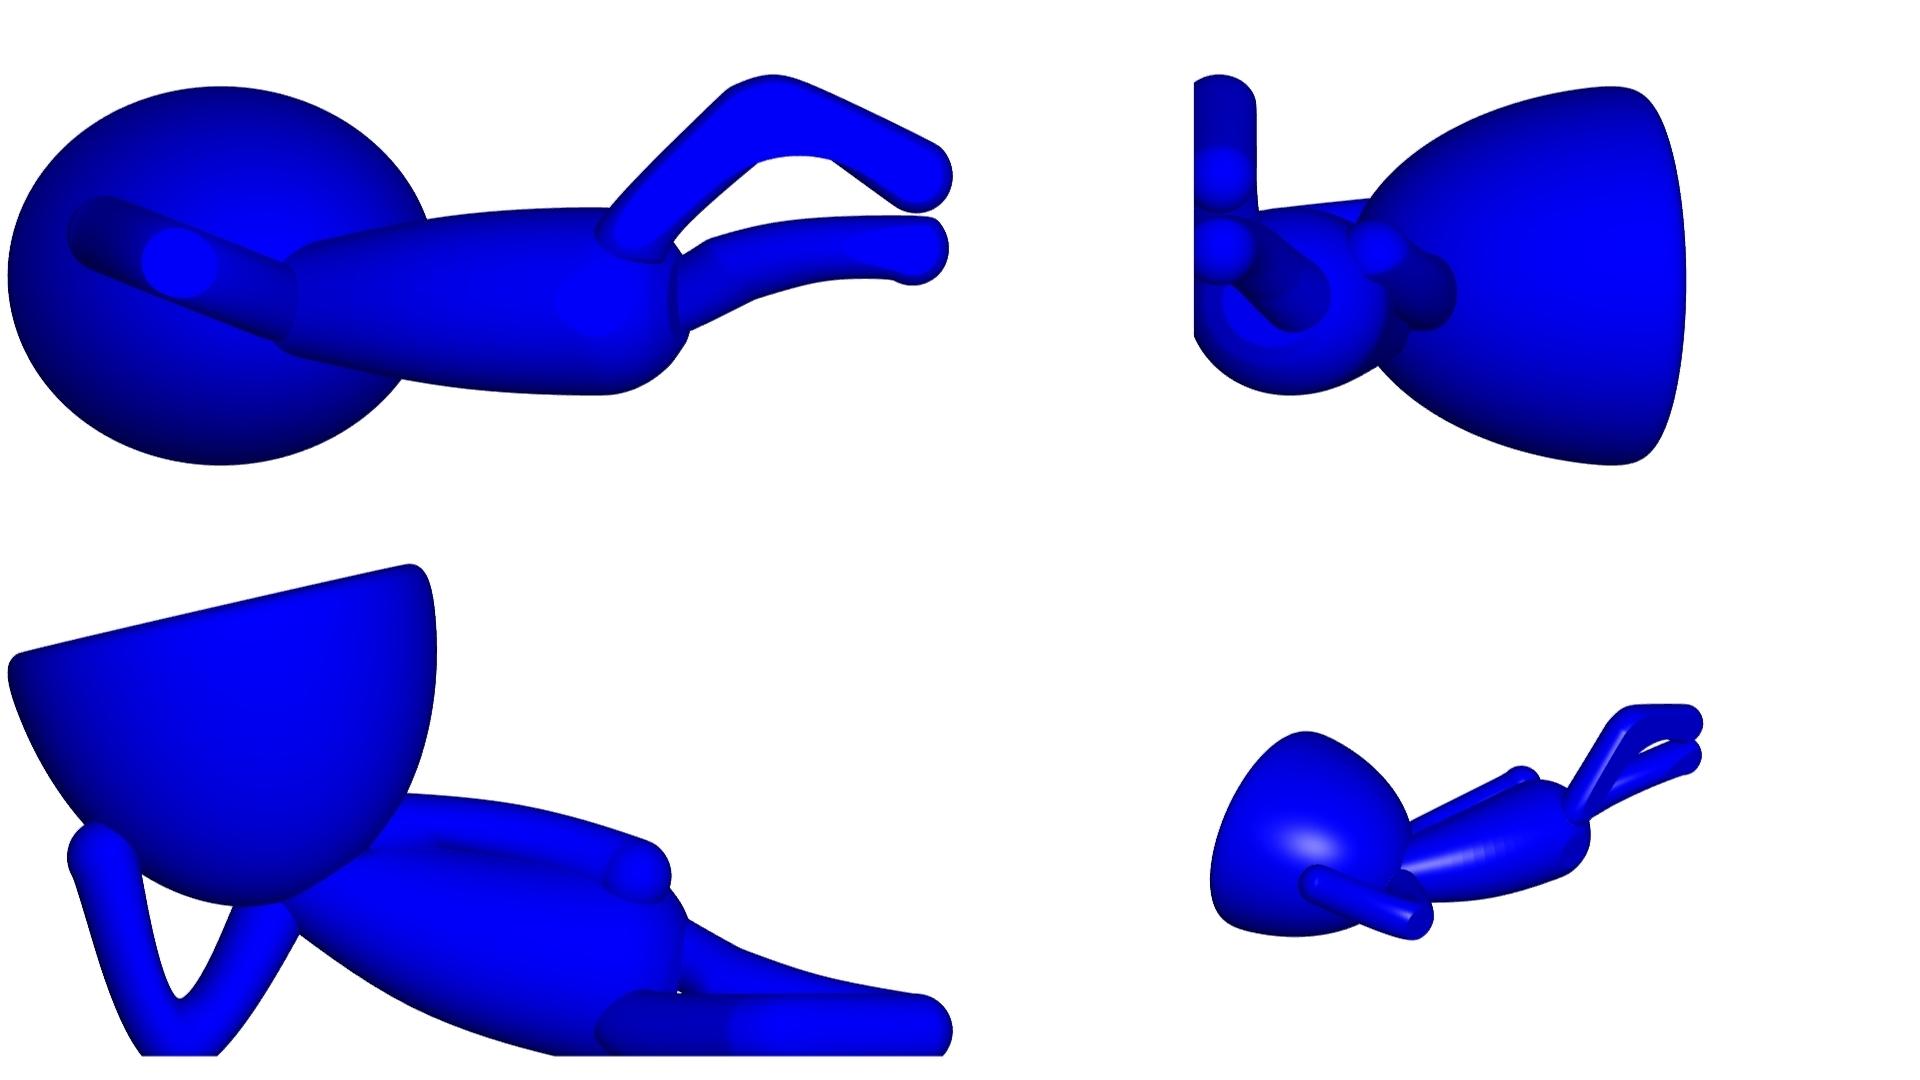 Vaso_10_azul_2.jpg Download free STL file JARRÓN MACETA ROBERT 10 - VASE FLOWERPOT ROBERT 10 • 3D printable object, PRODUSTL56